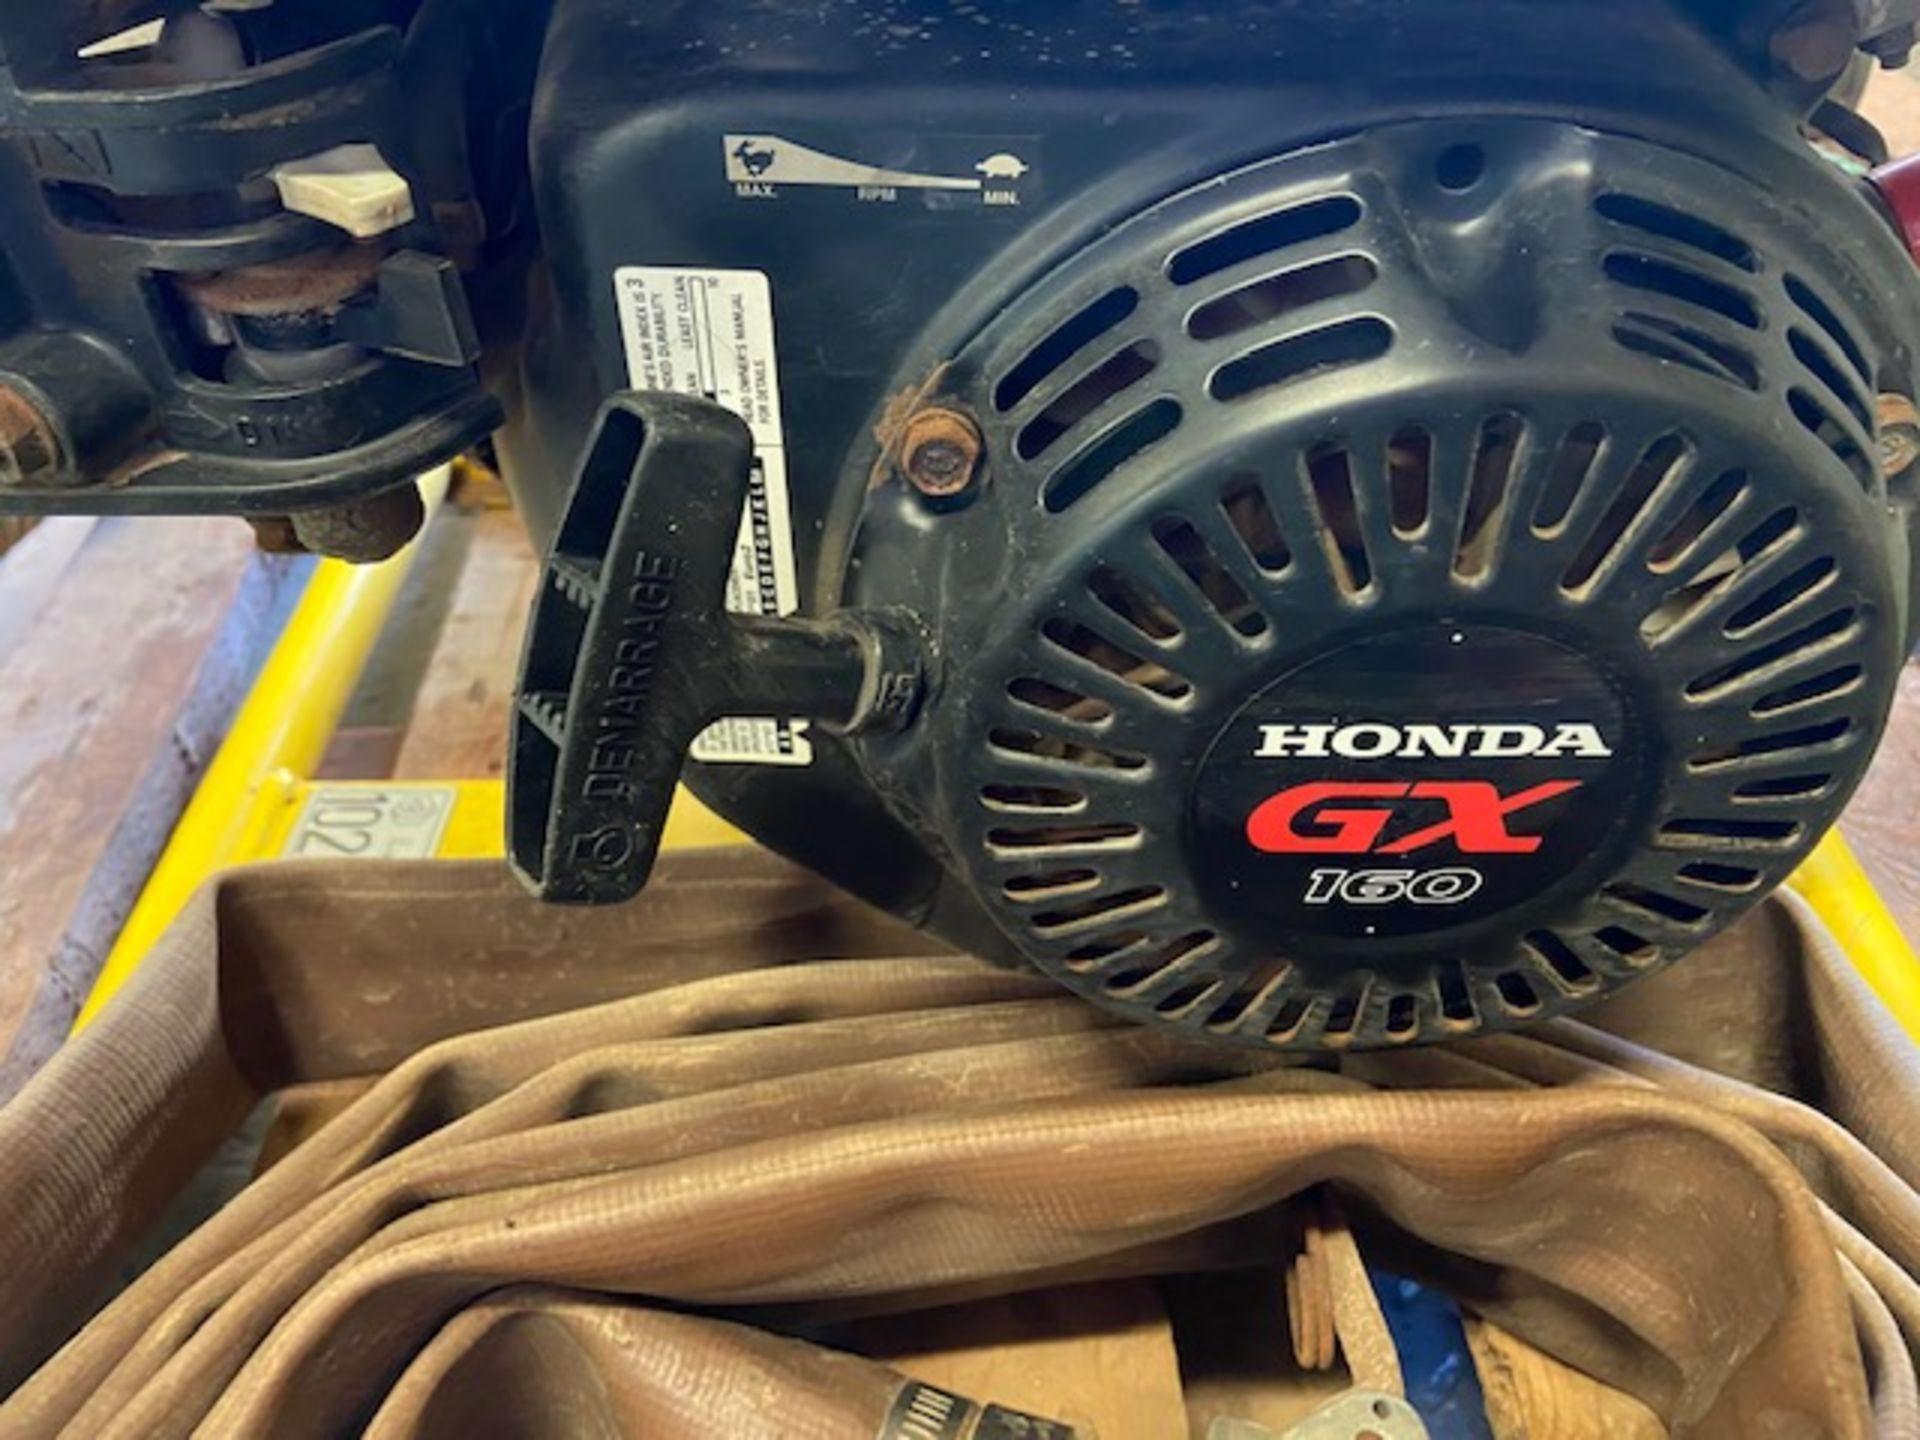 Wacker Neuson PT2 Water Pump Unit with Honda GX160 Motor - Image 3 of 3